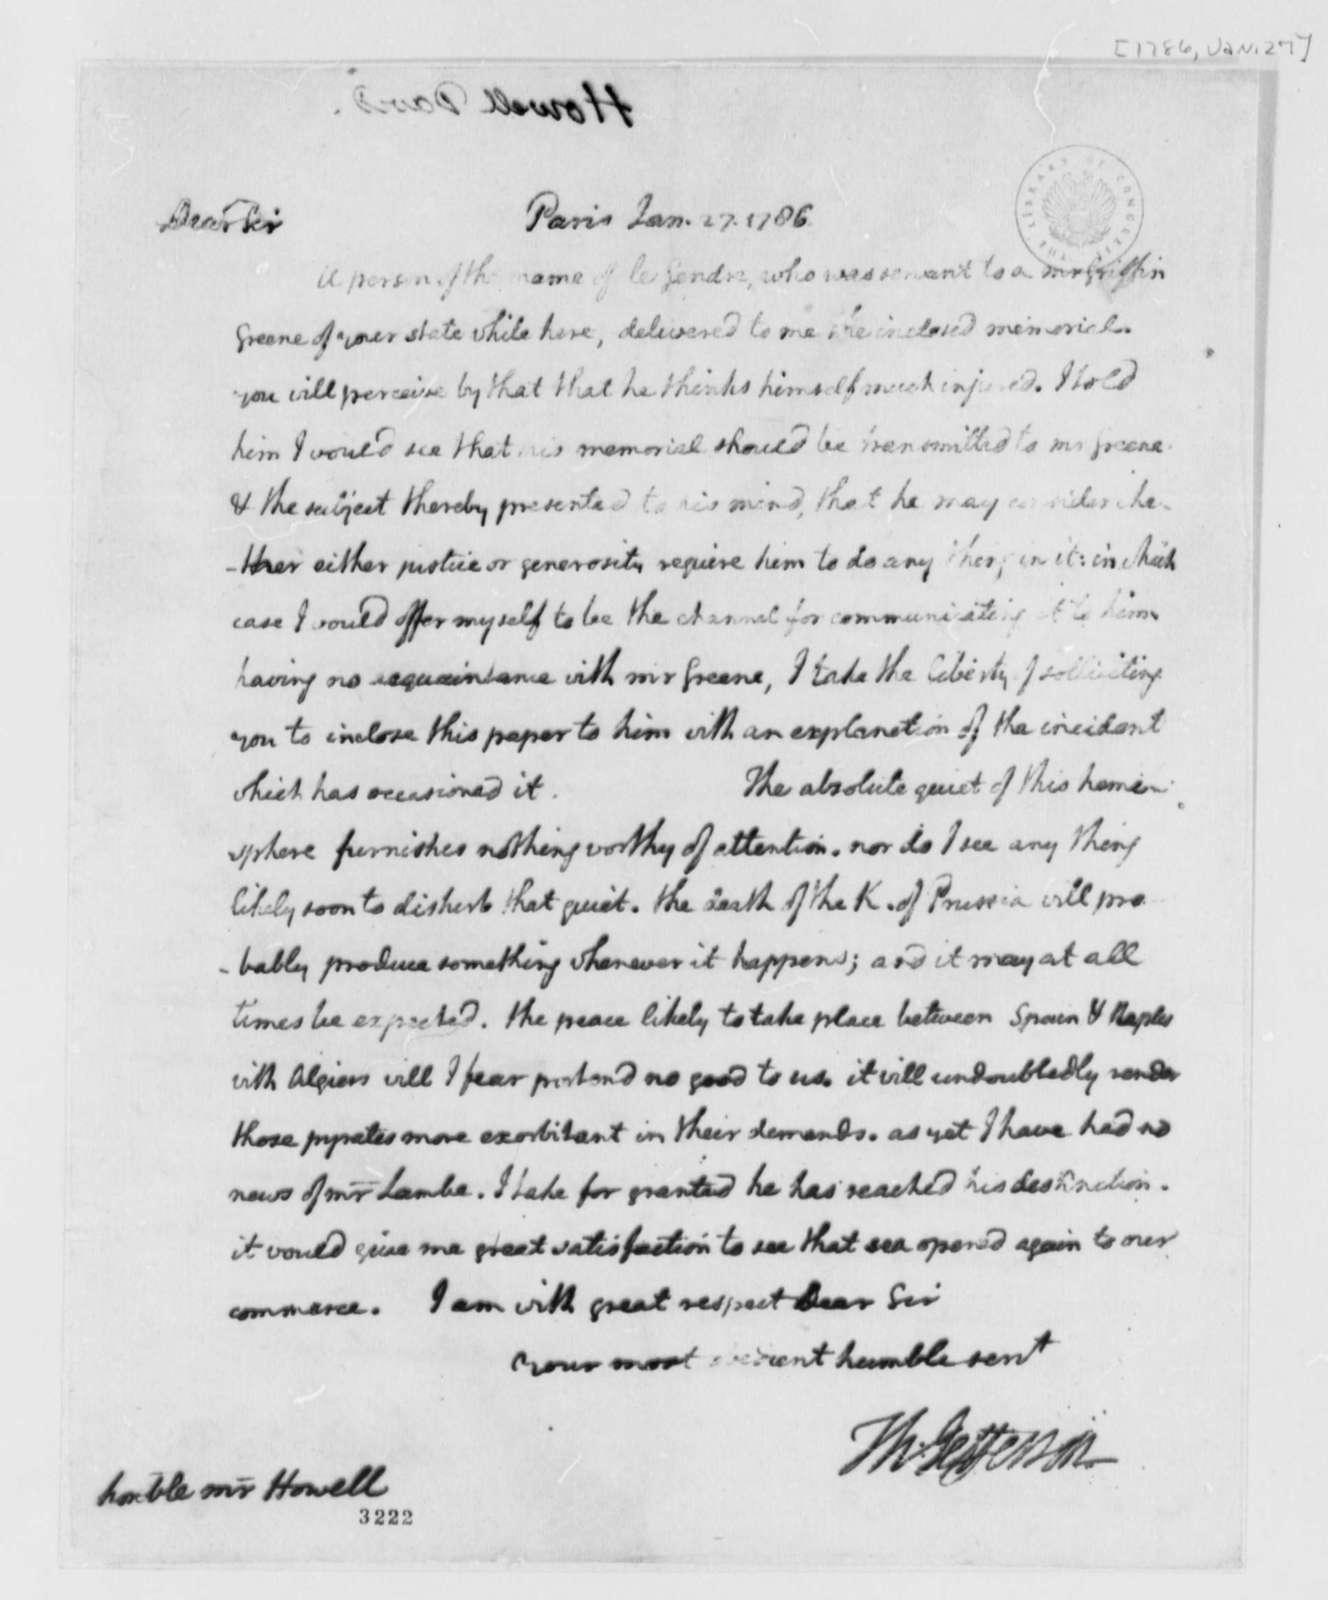 Thomas Jefferson to David Howell, January 27, 1786